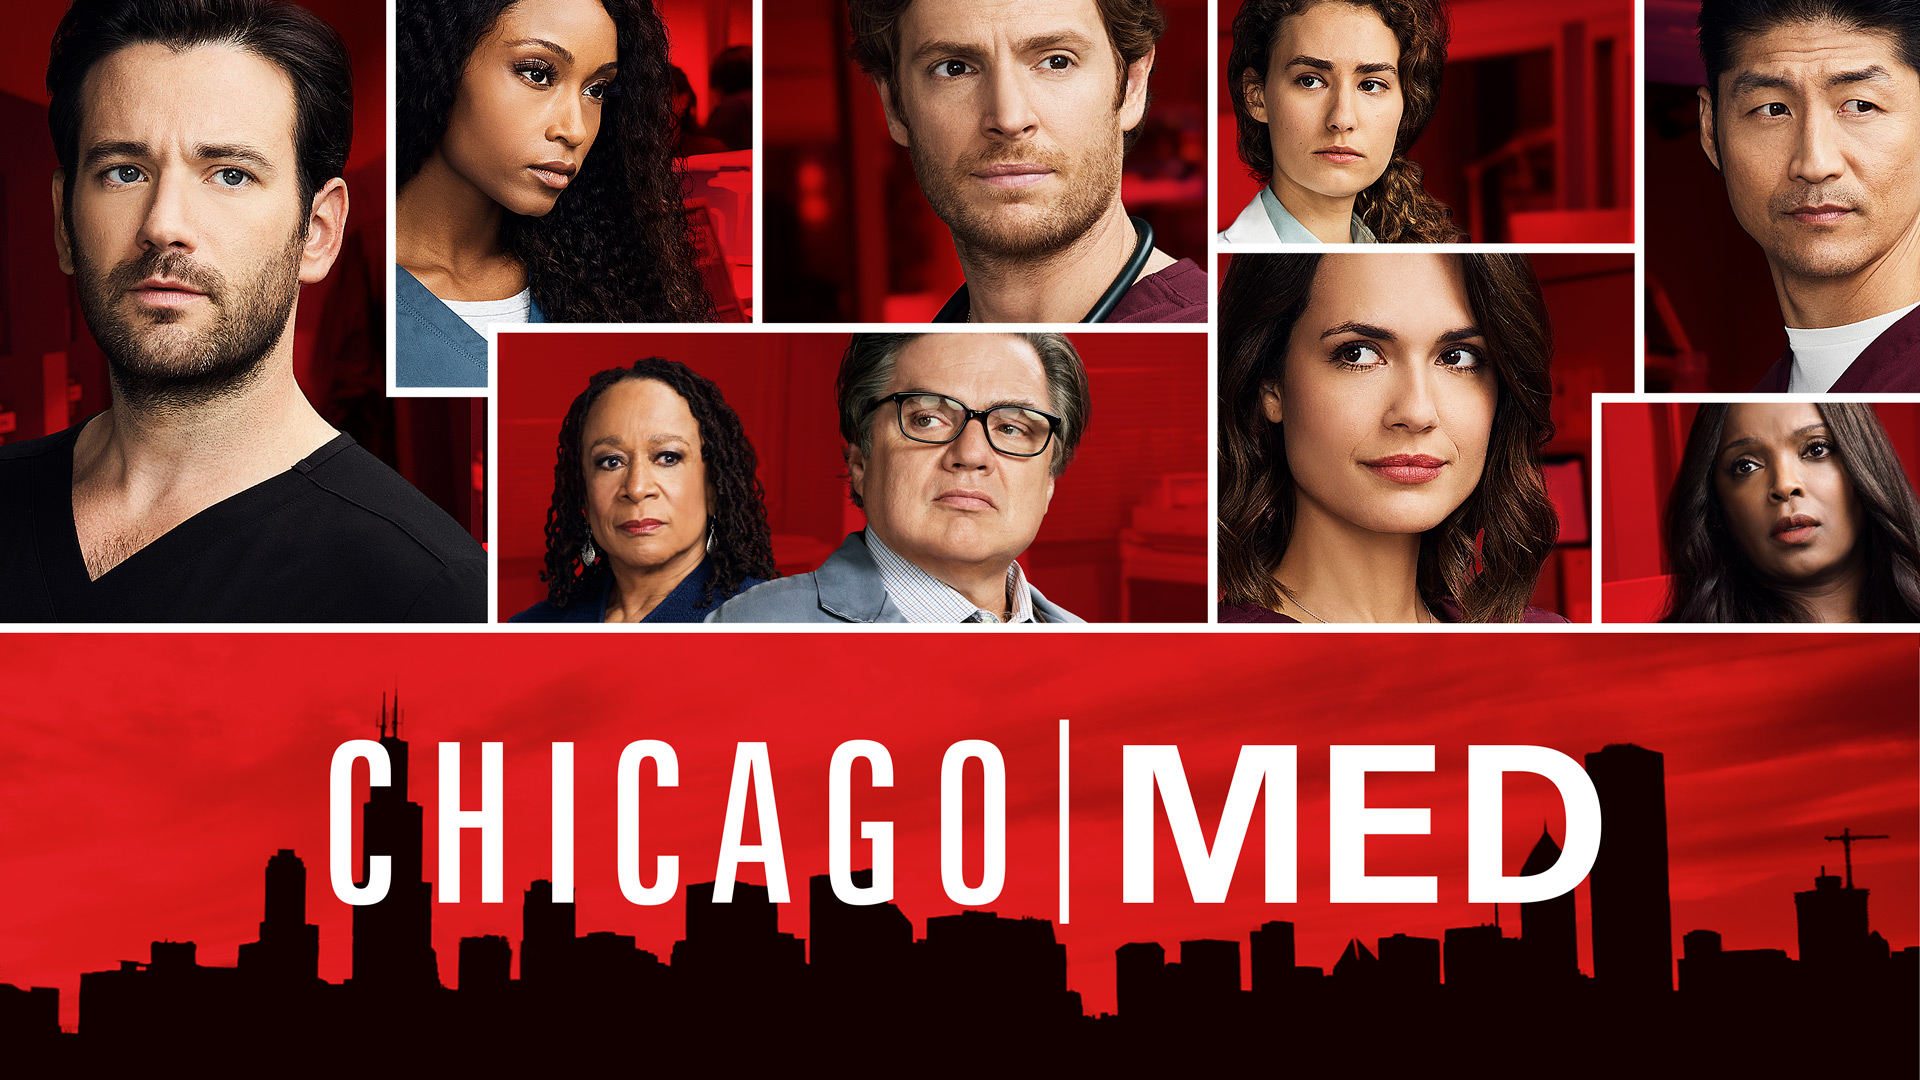 chicago med season 3 episodes